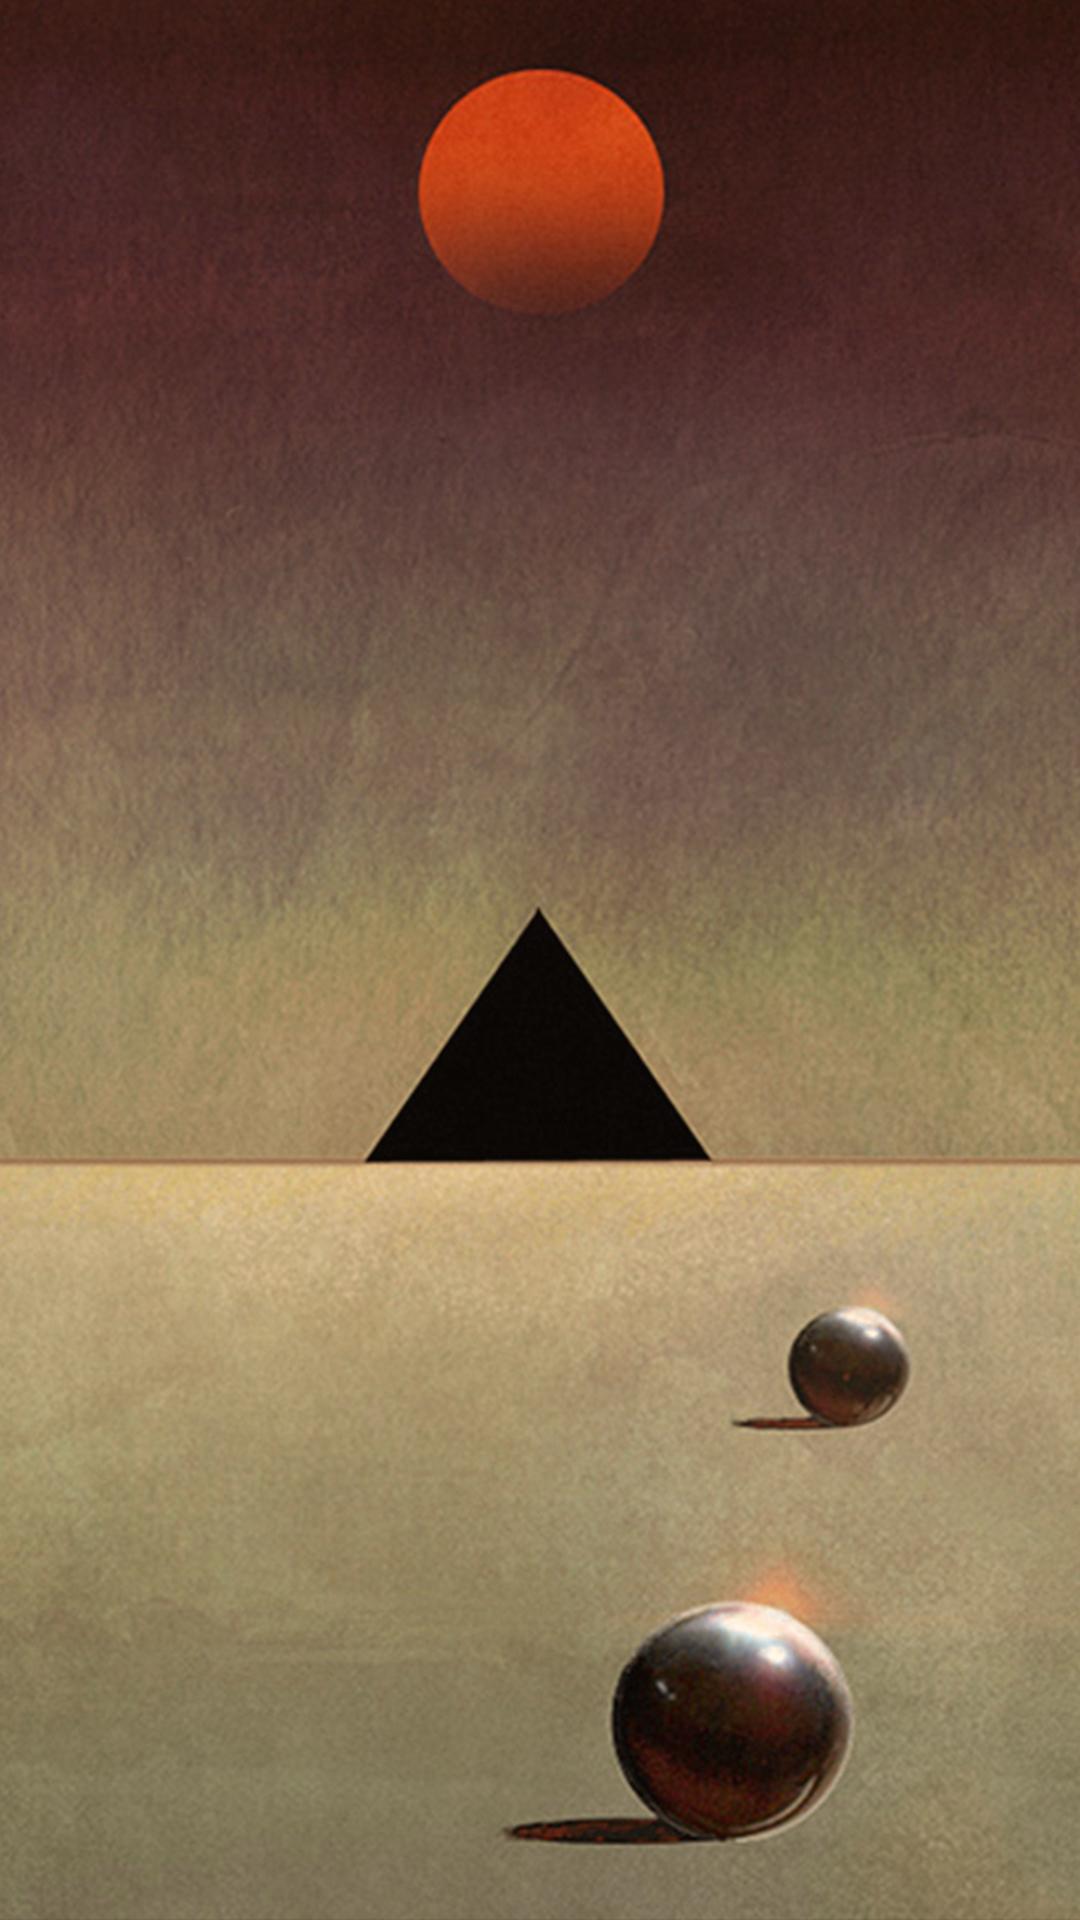 geometry-grunge-4714